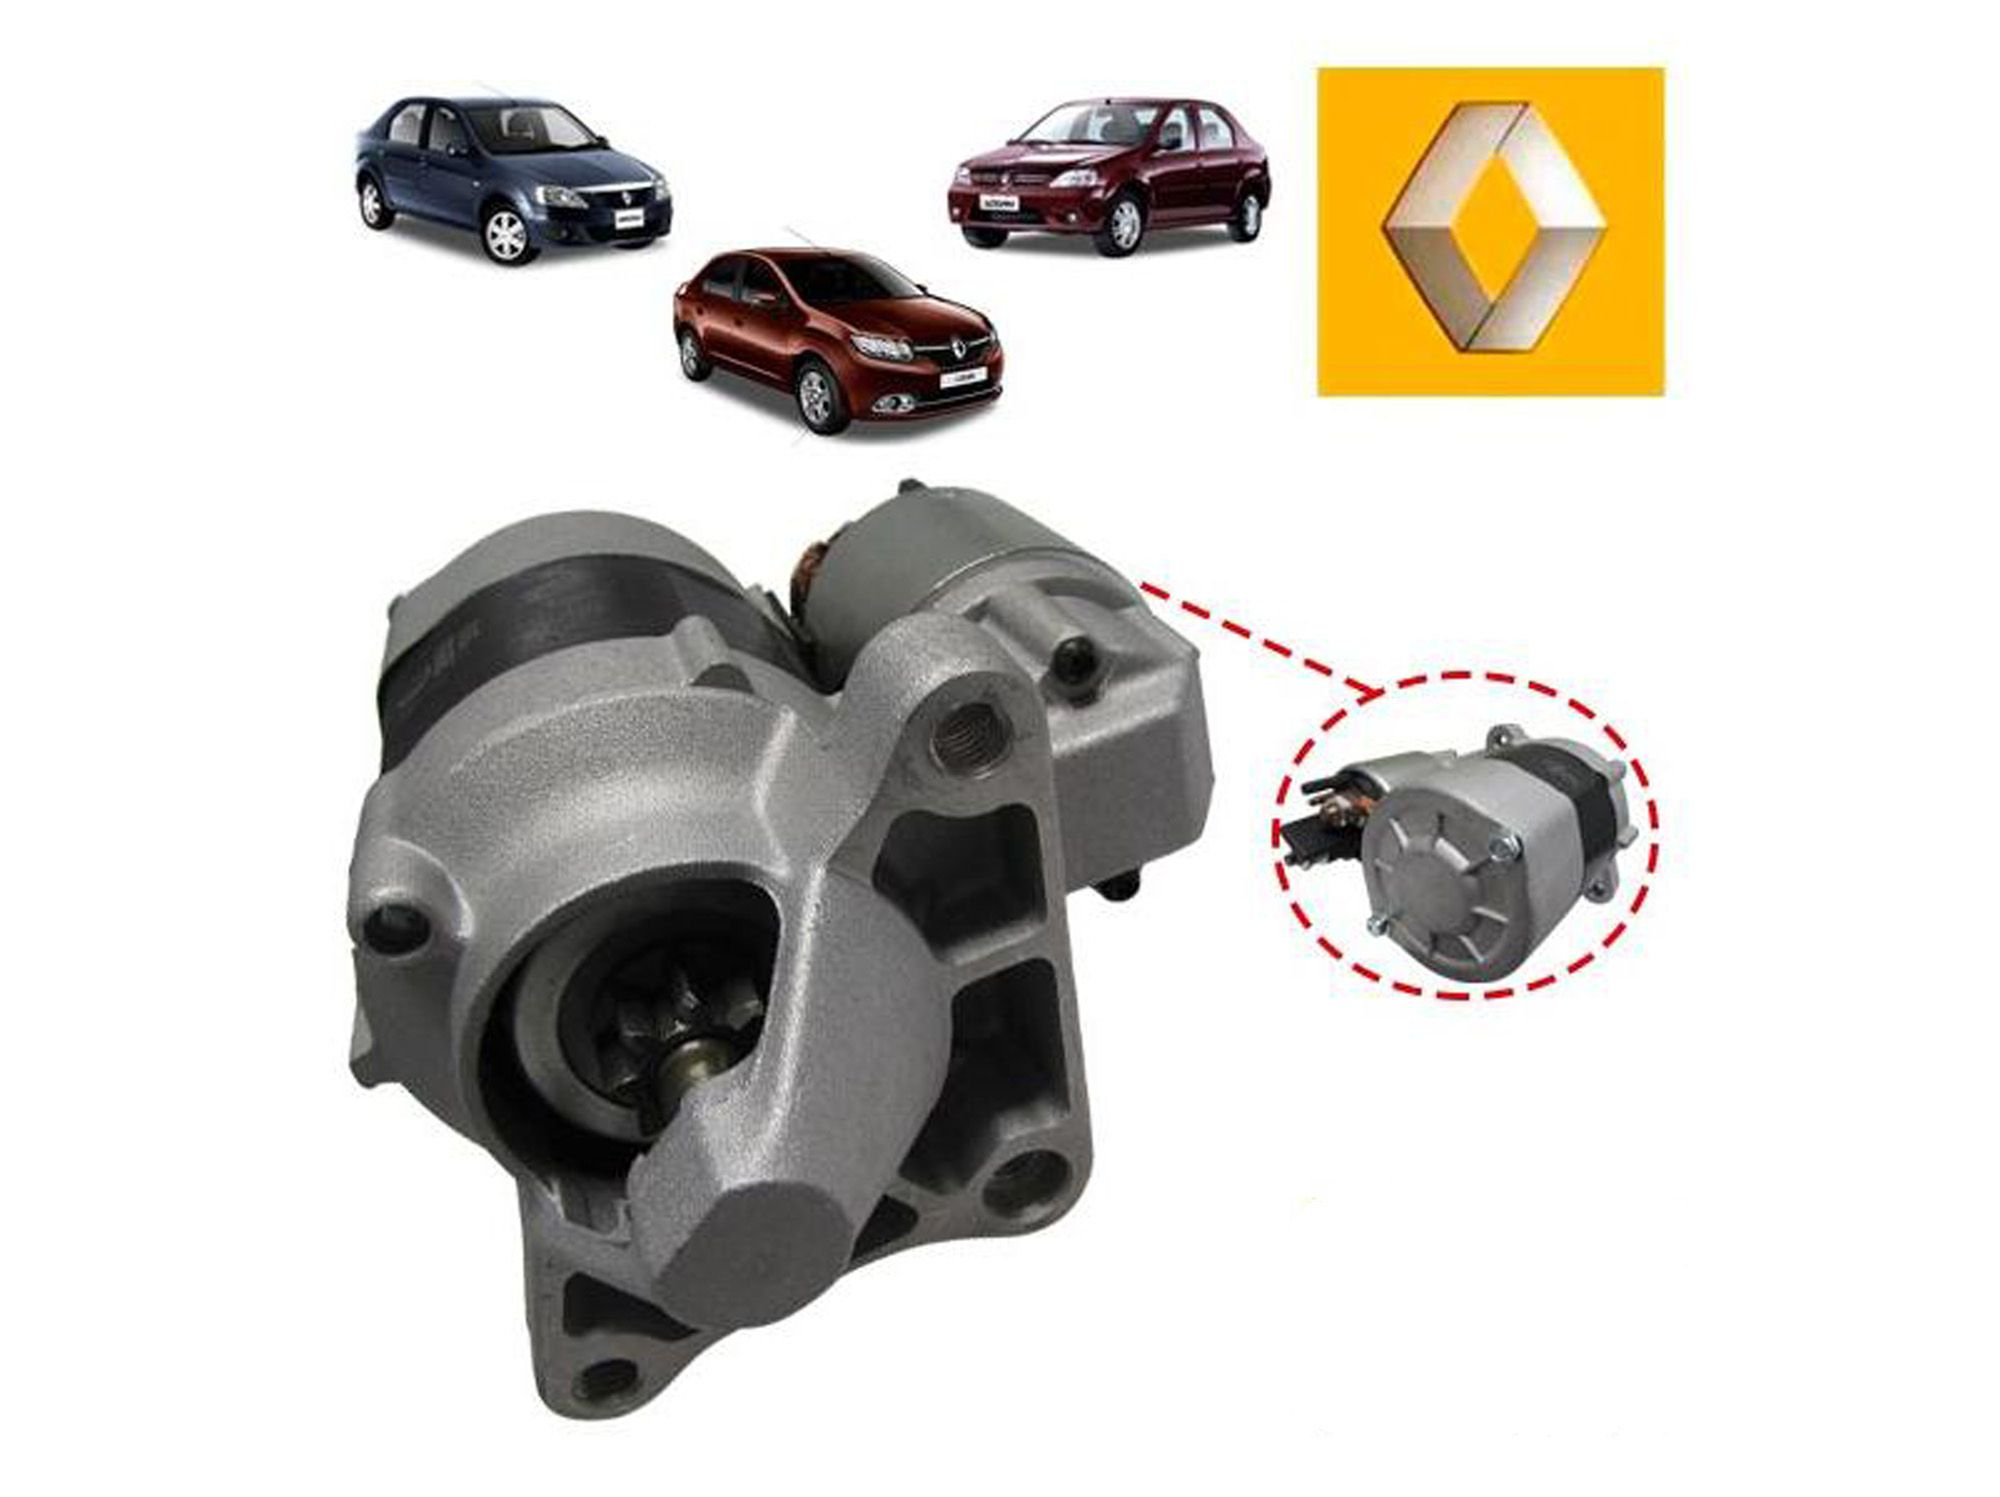 Motor de arranque - Renault Clio HI flex 1.6 16v, Duster 1.6 16v, Kangoo 1.6 8v/16v, Sandero 1.6 8v/16v, Logan 1.6 8v/16v, Symbol 1.6 16v,  Fluence 1.6 16v, Megane II 1.6 16v